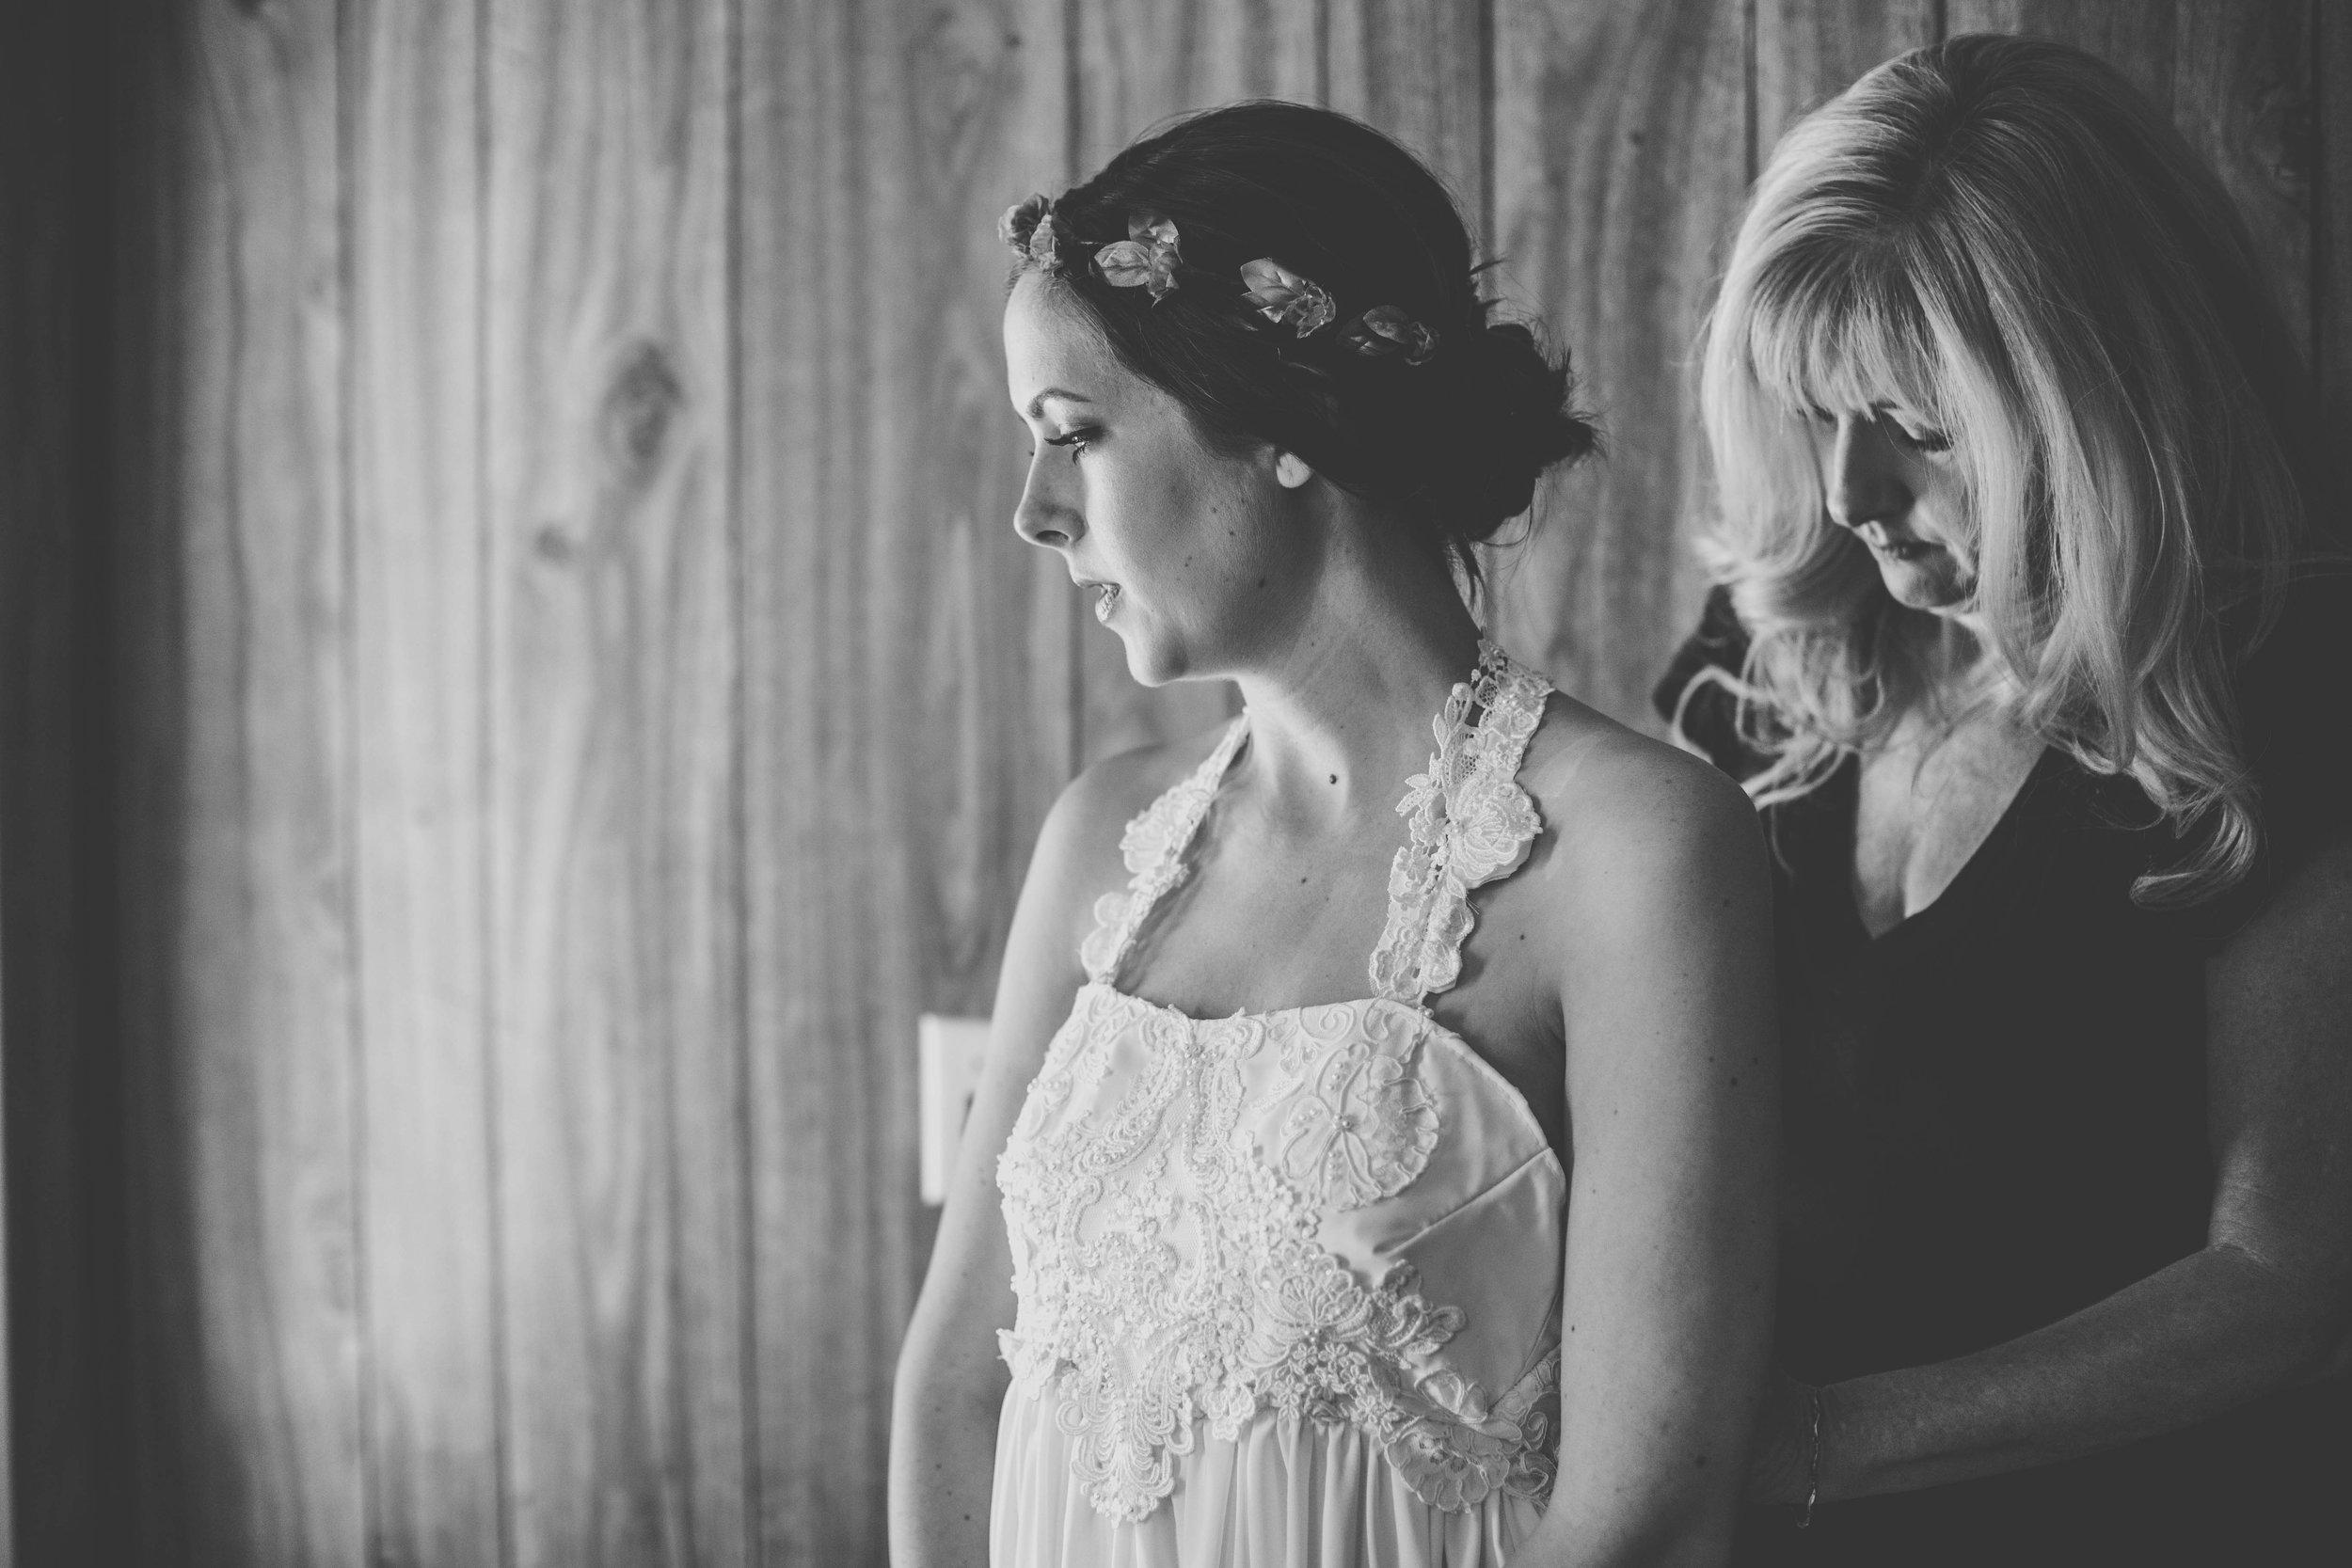 20141024-DePartee-Wedding-APavone-006-sm.jpg